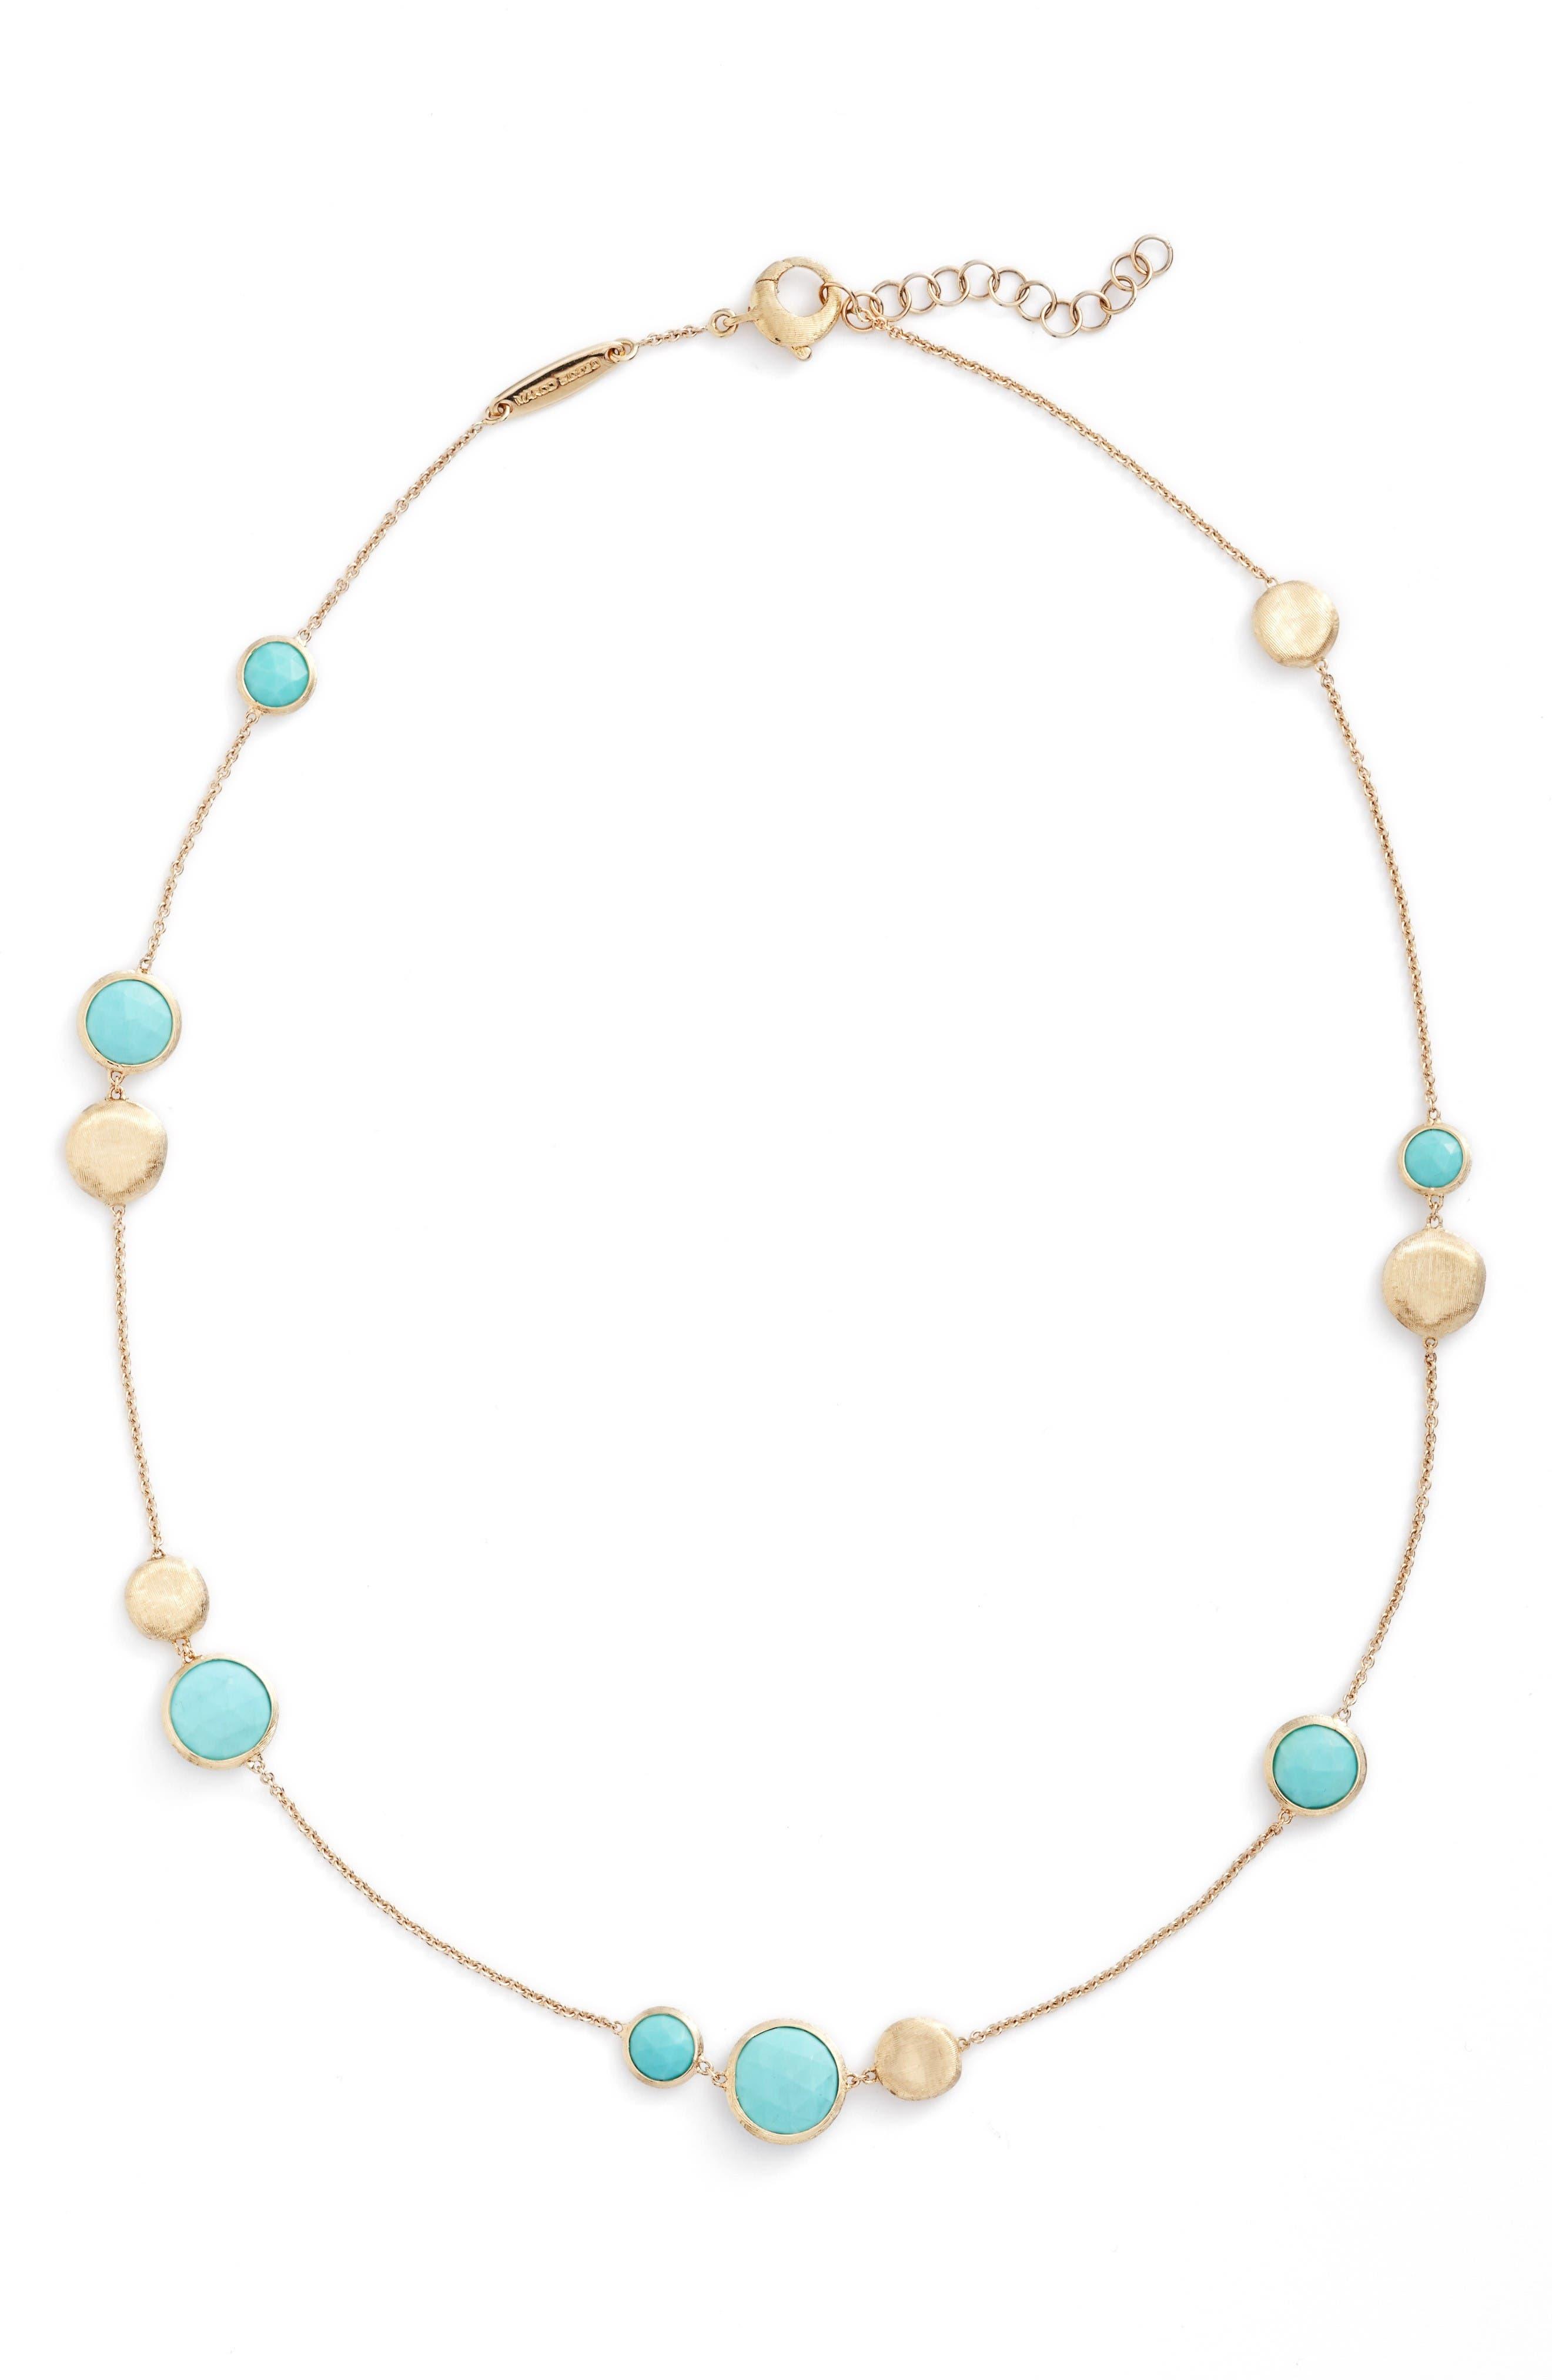 MARCO BICEGO Jaipur Stone Collar Necklace